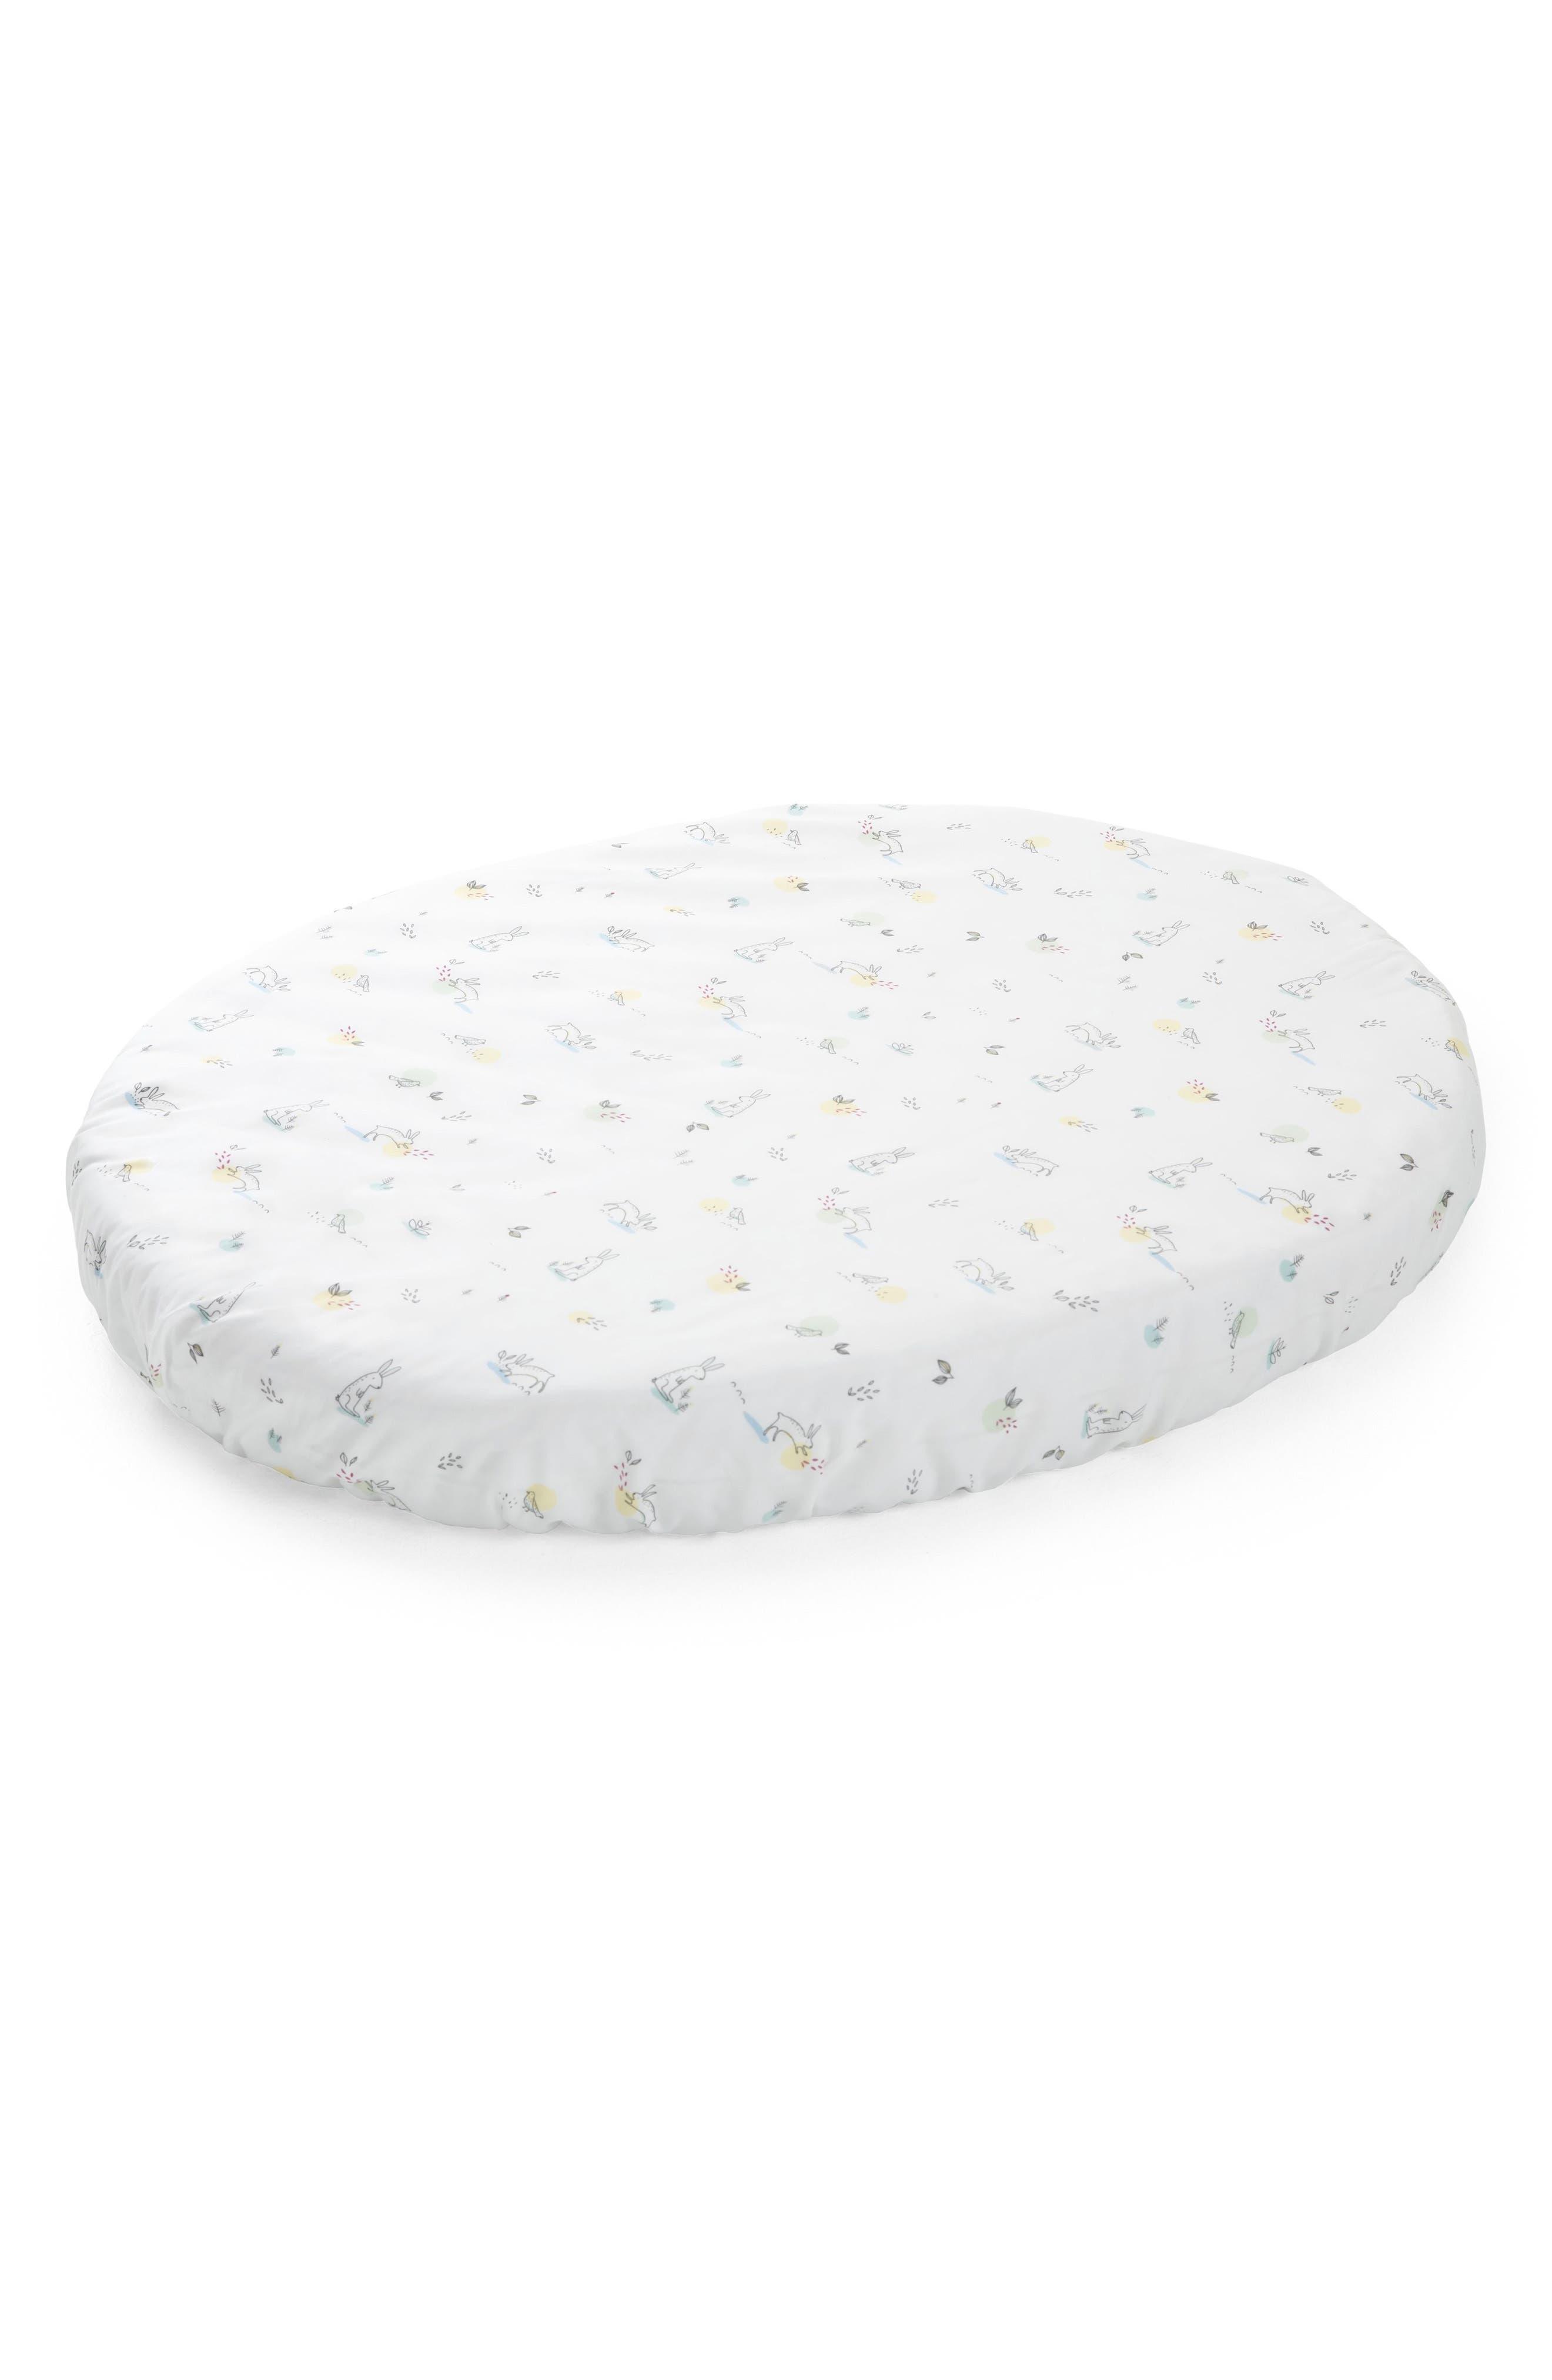 madras kili seng